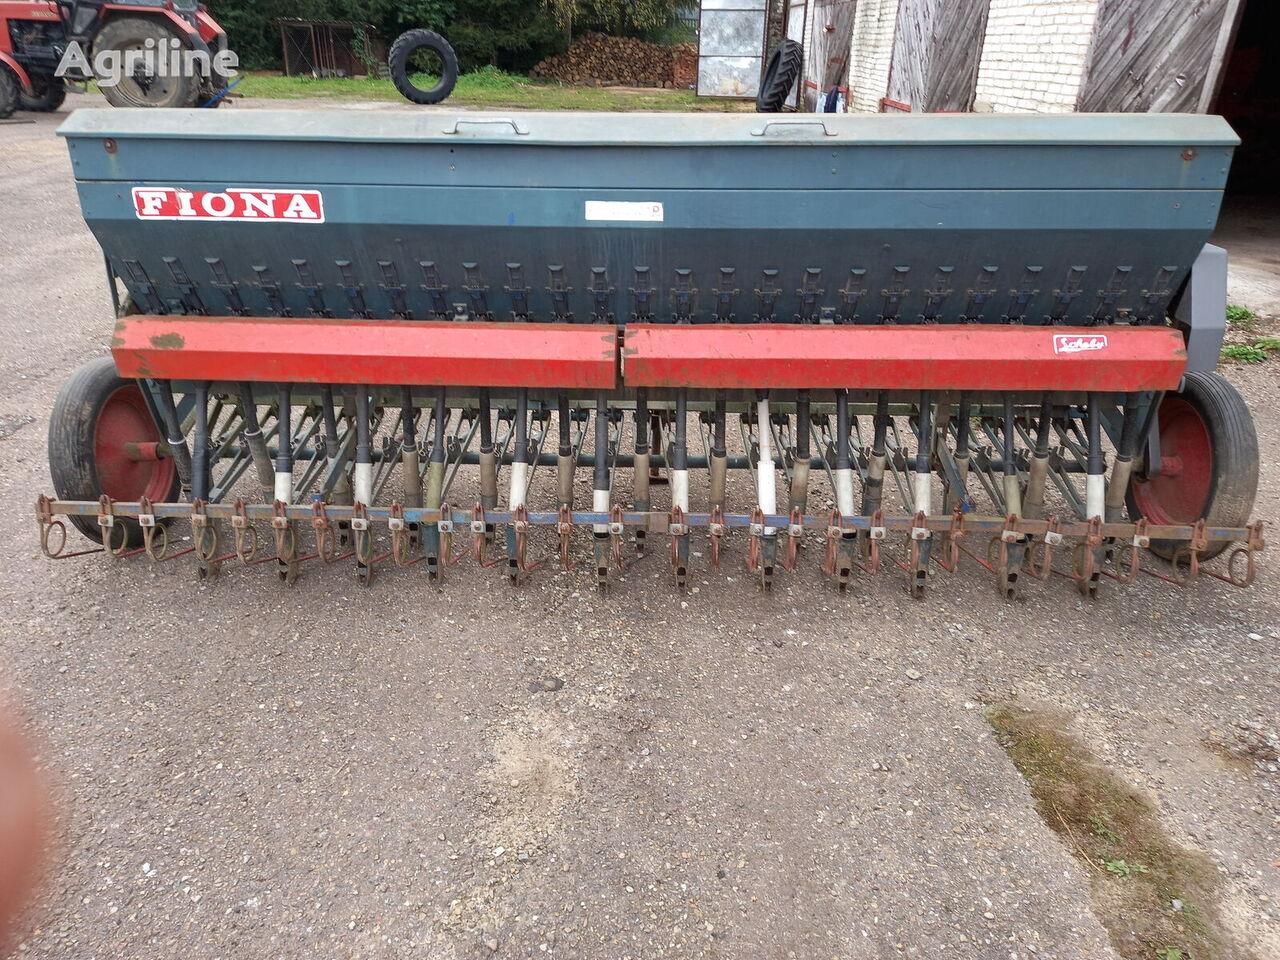 FIONA SD mechanical seed drill